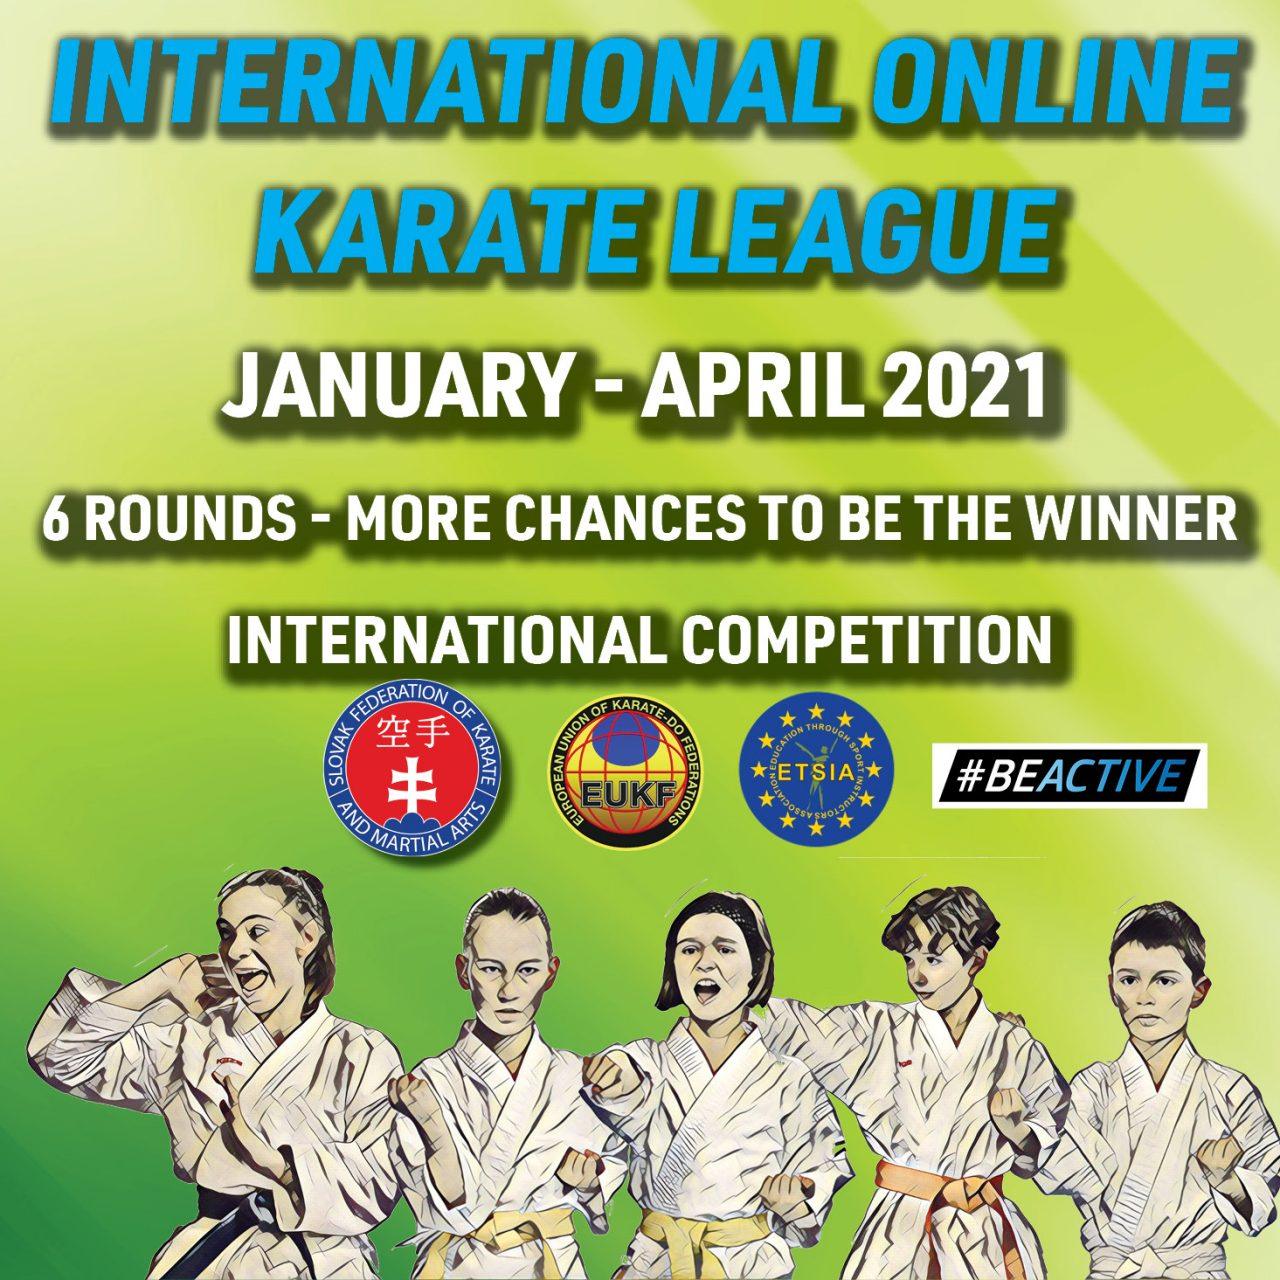 https://karate-slovakia.sk/wp-content/uploads/league_clanok-1280x1280.jpg